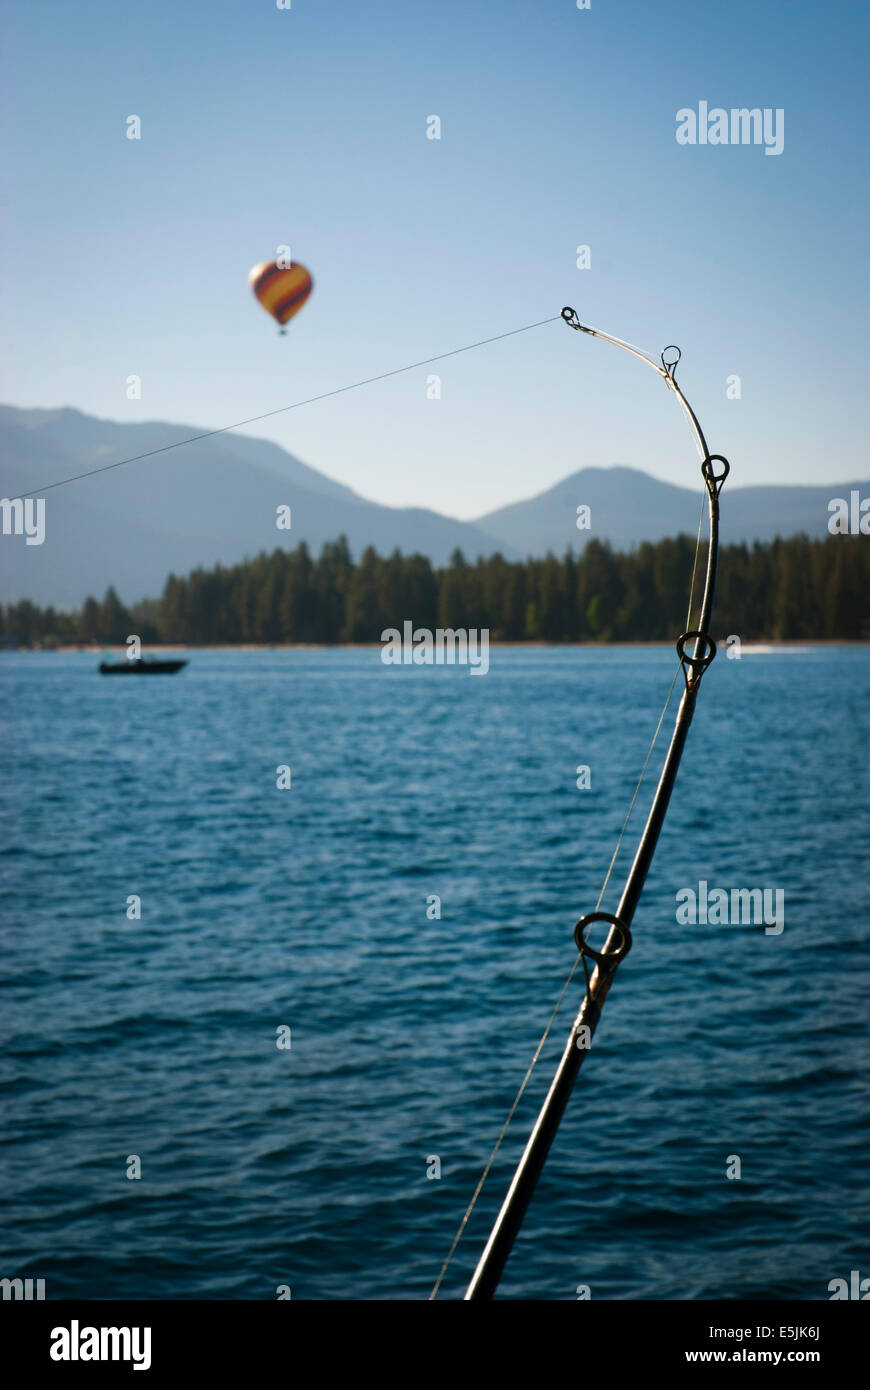 Balloon rising over Lake Tahoe, Nevada USA Stock Photo